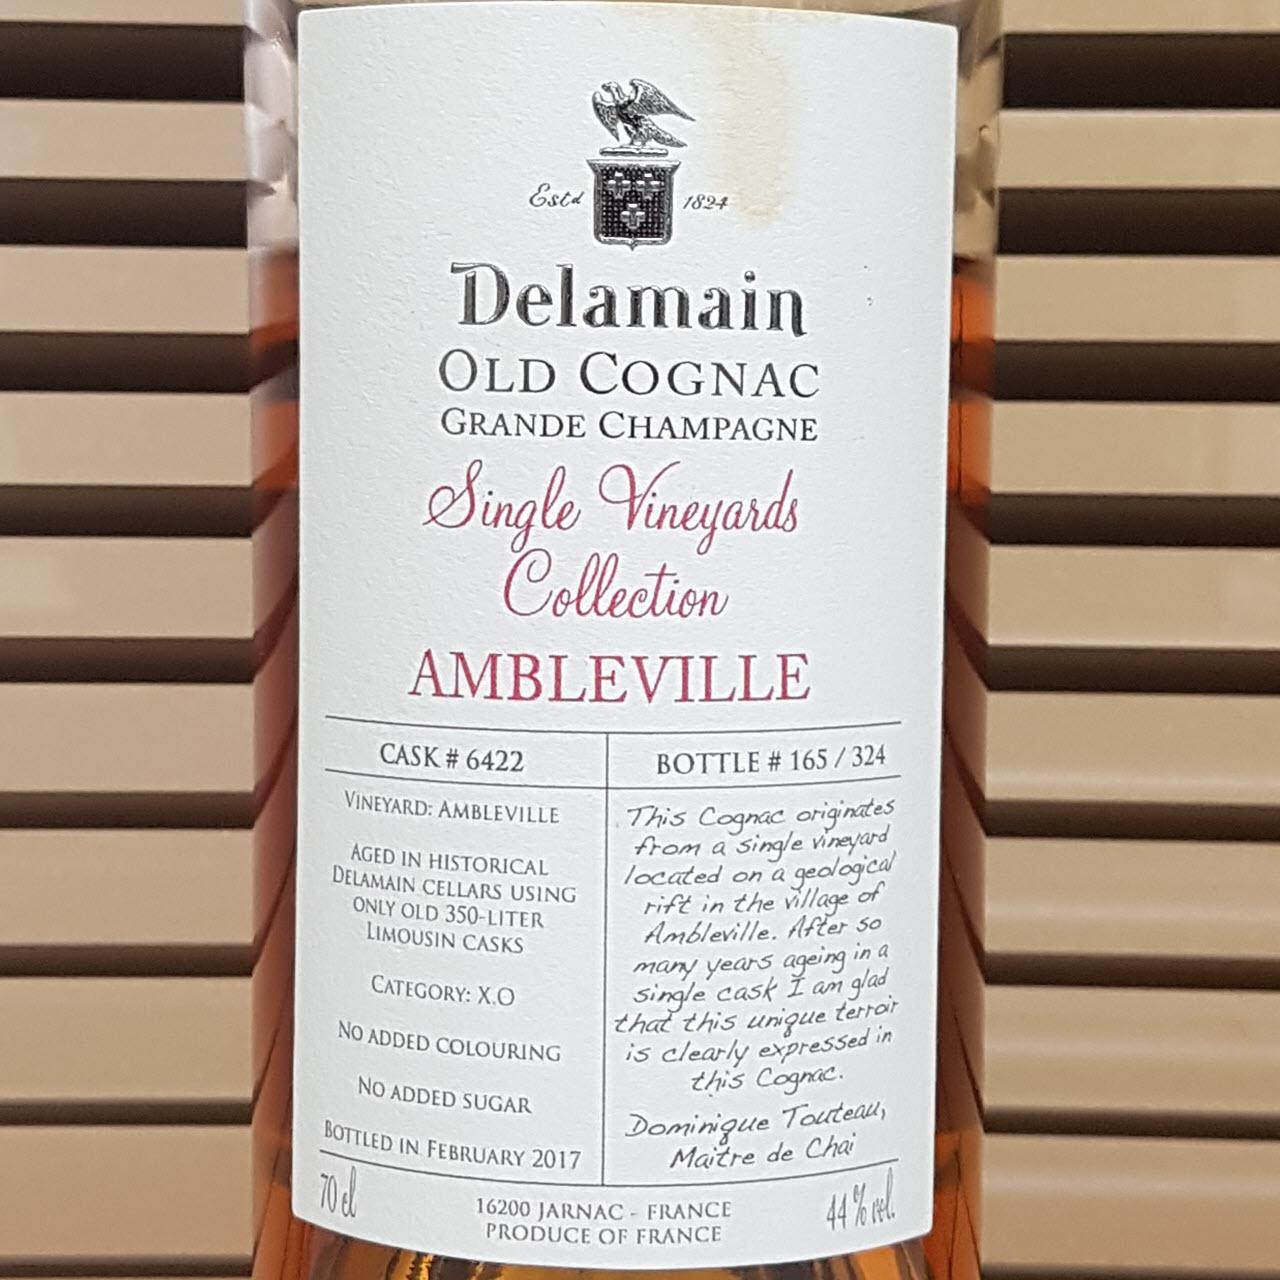 Delamain Grande Champagne Ambleville